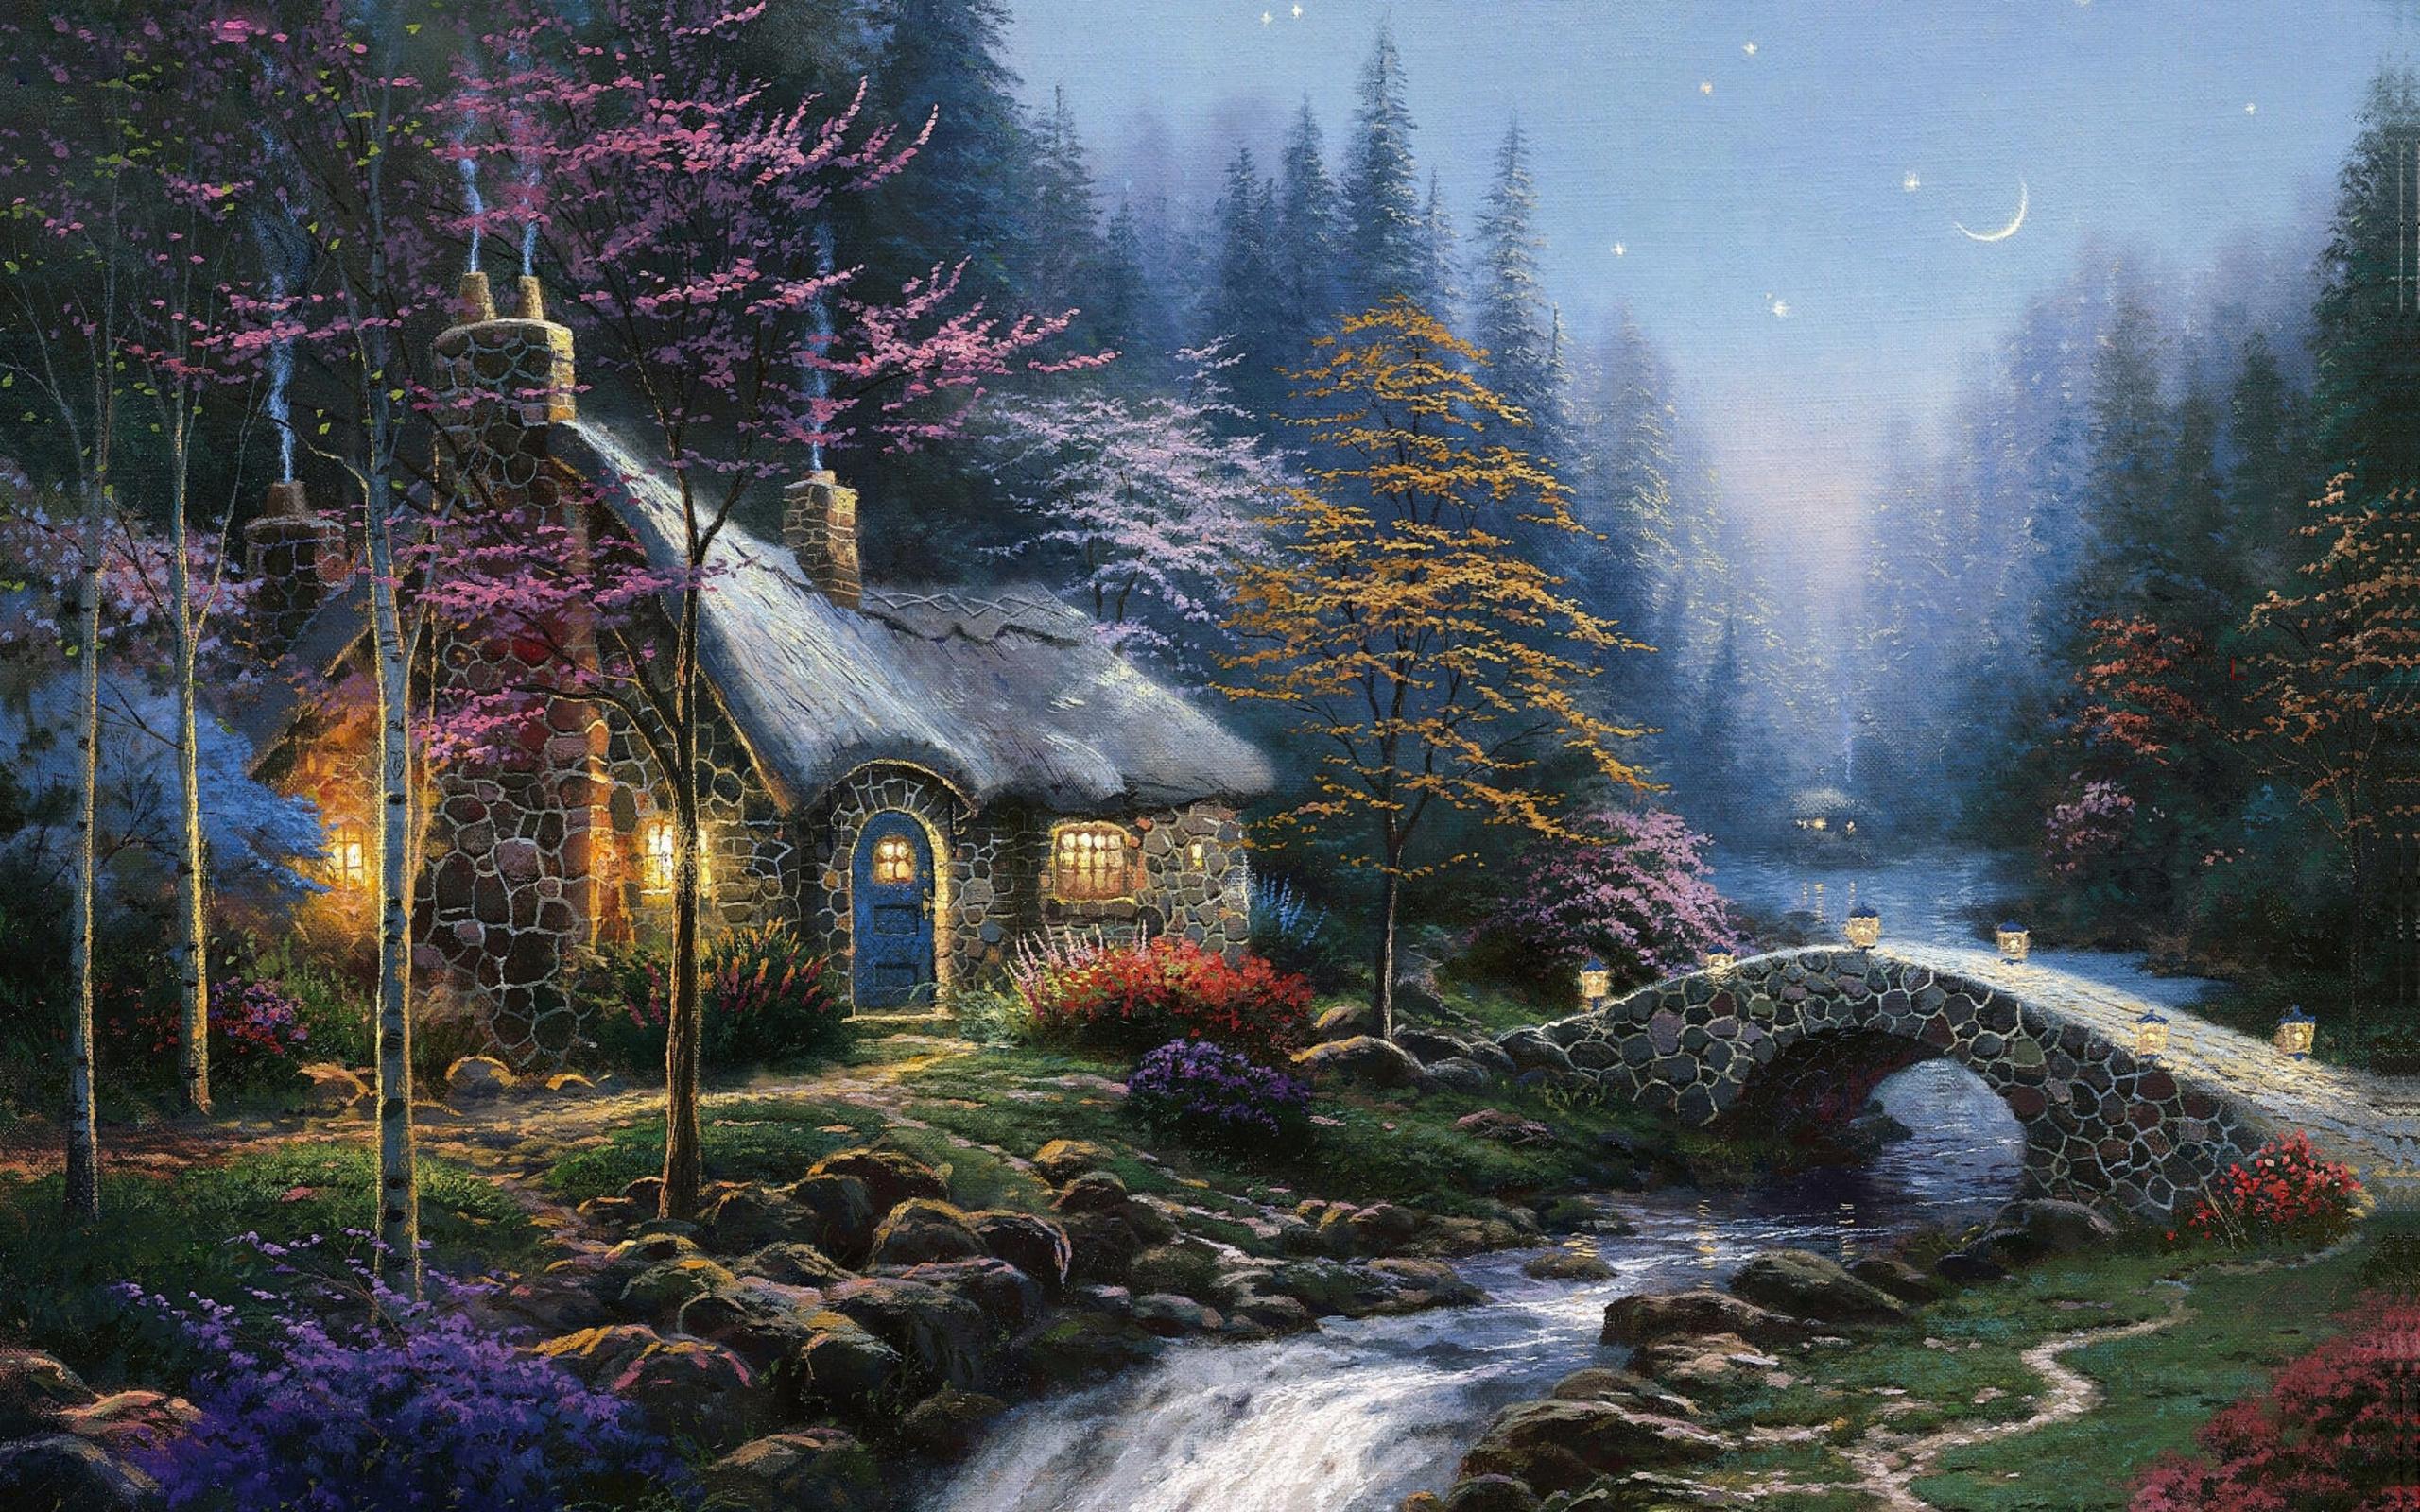 Wallpaper Thomas Kinkade art twilight moon stars forests spruce 2560x1600